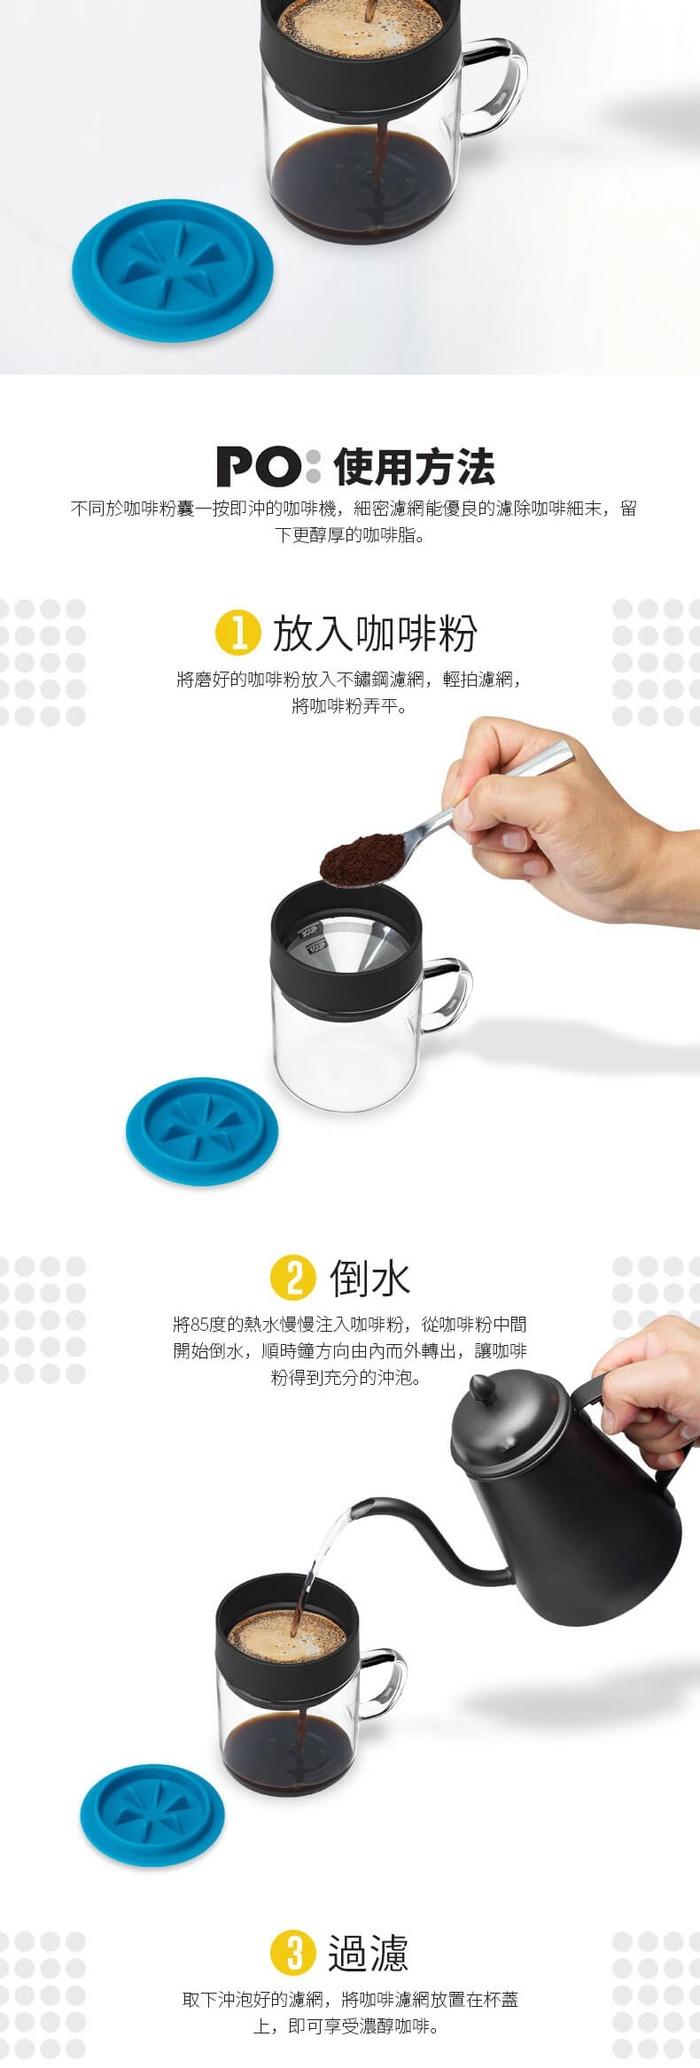 PO:Selected|丹麥研磨過濾咖啡玻璃杯240ml (紅)